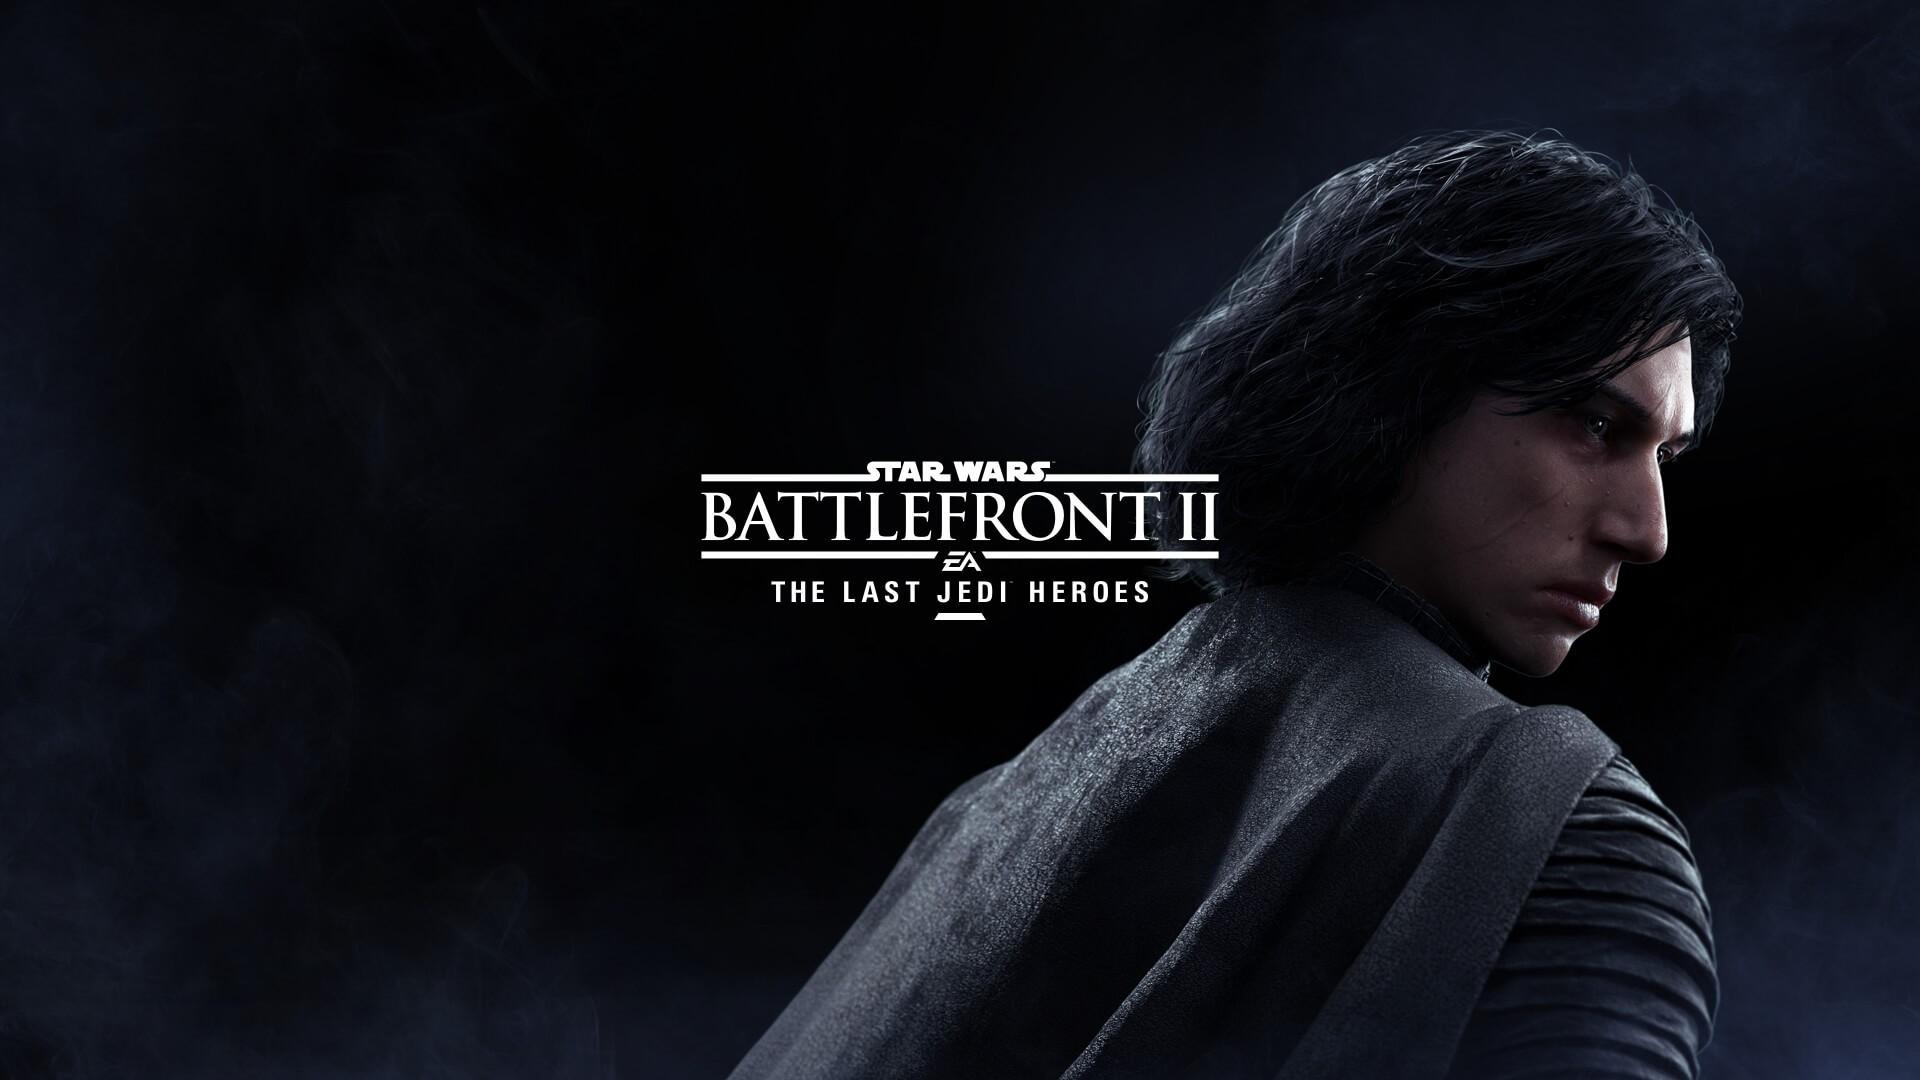 Kylo Ren The Last Jedi Wallpaper